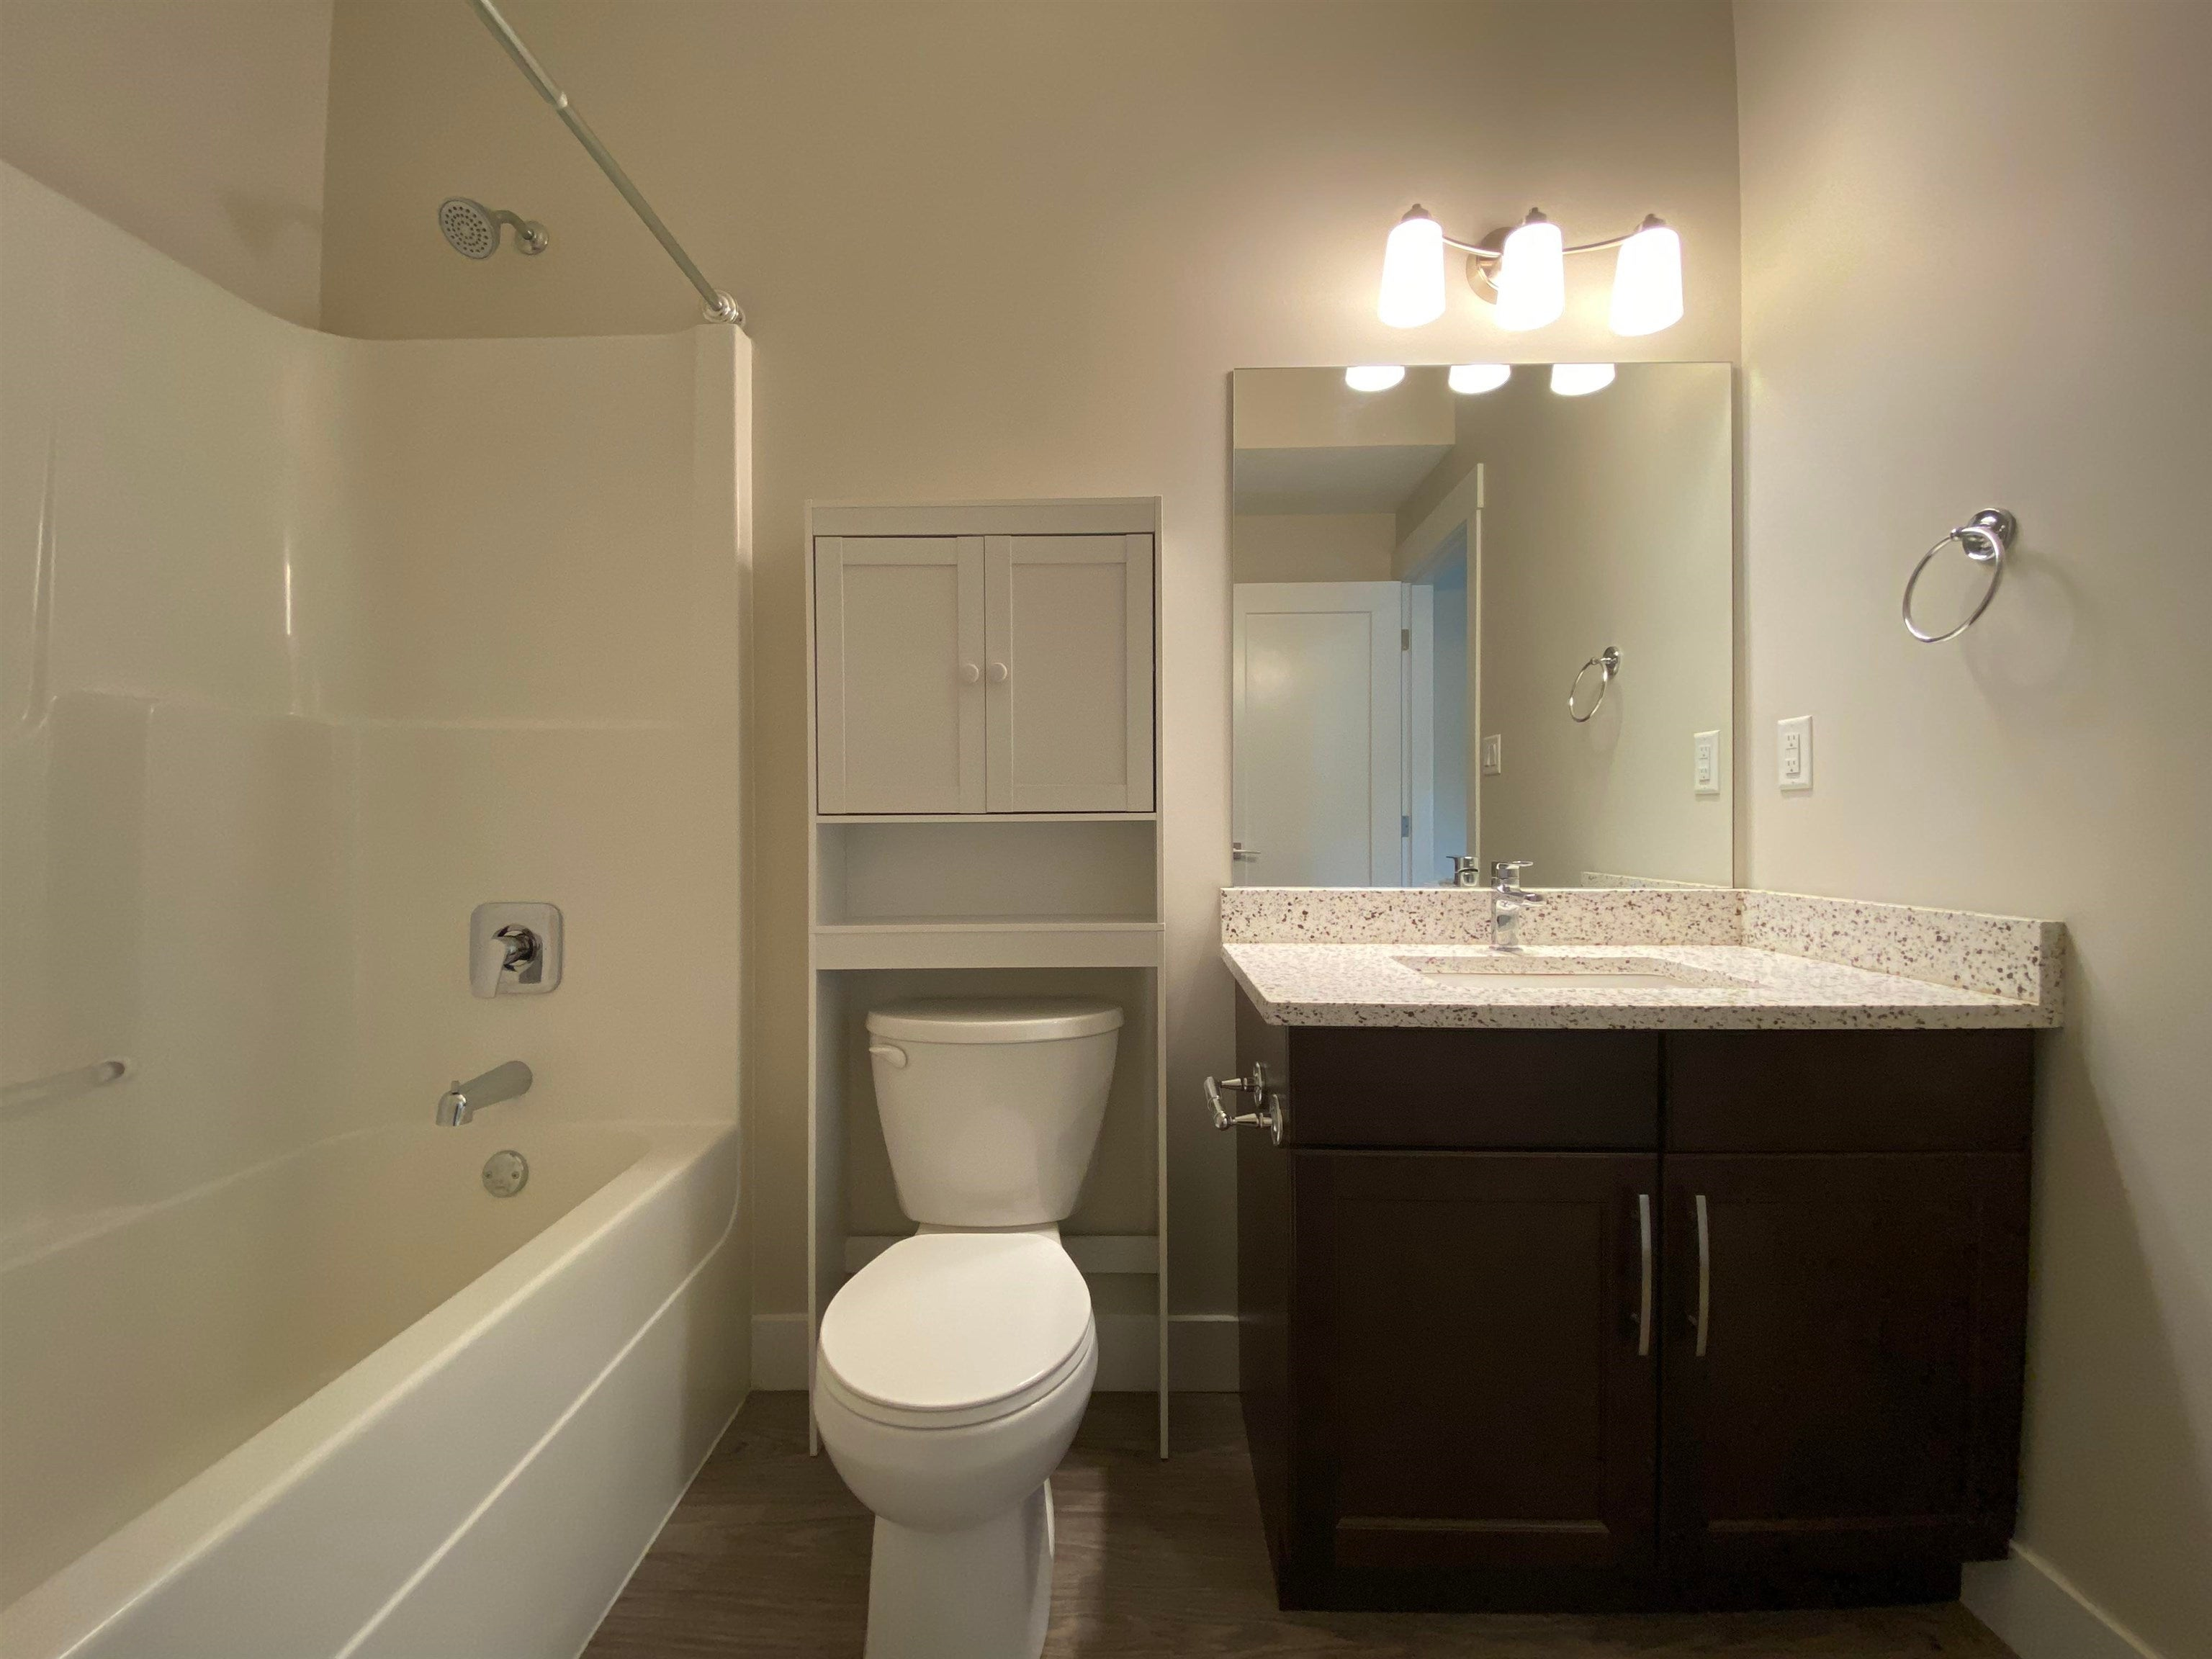 10144 KILLARNEY DRIVE - Fairfield Island House/Single Family for sale, 5 Bedrooms (R2625716) - #31